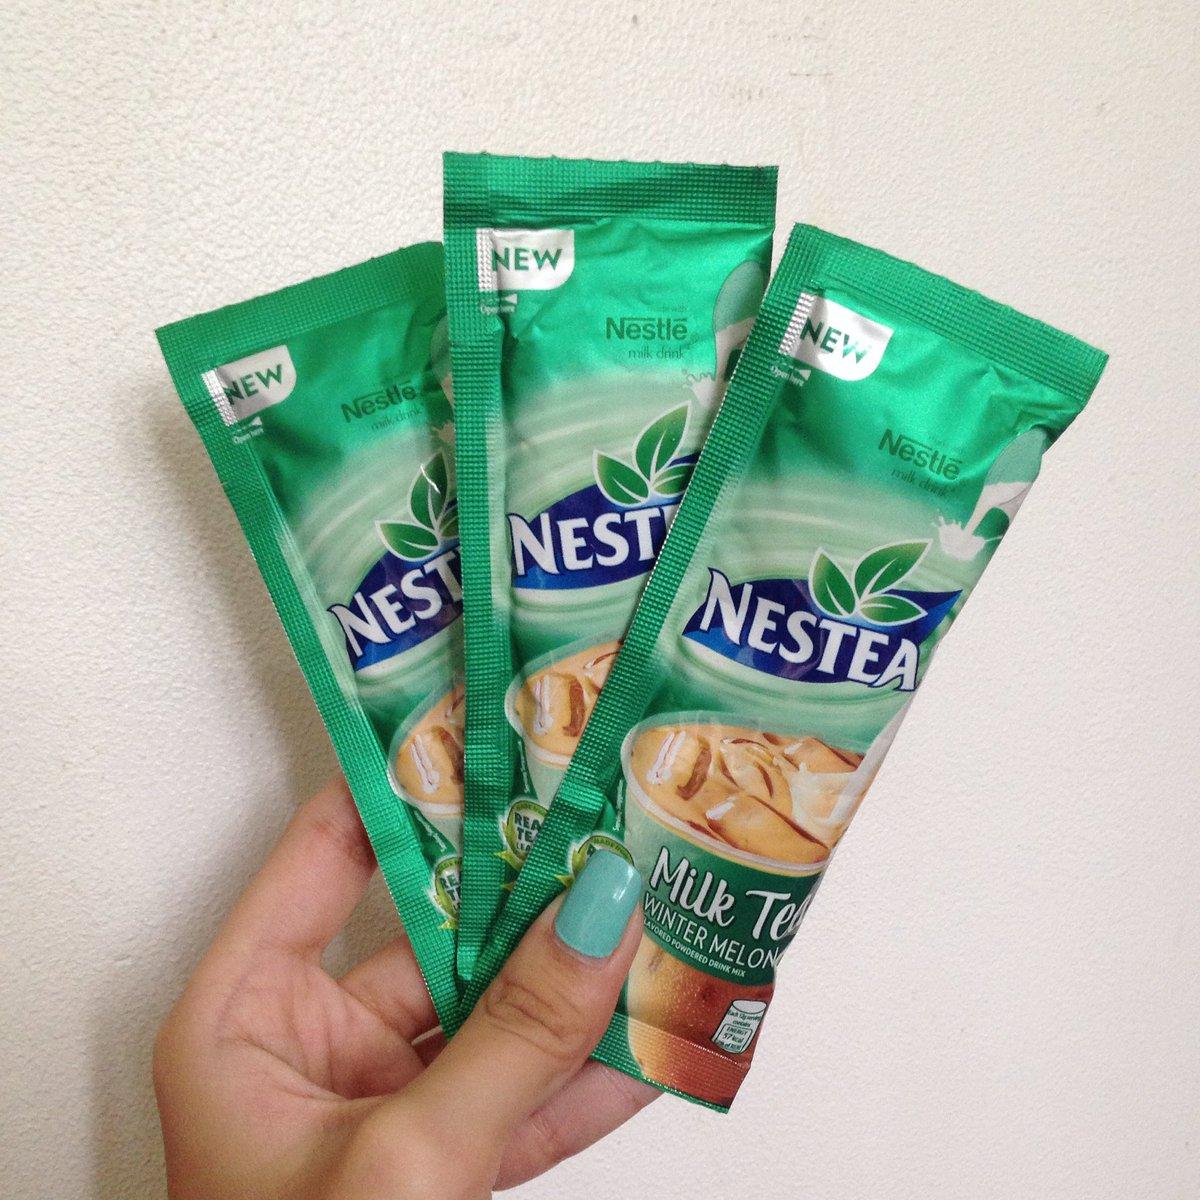 nestea's wintermelon milk tea has me SHOOKT & it's for 9 pesos only???! https://t.co/ueRjLlXQdK